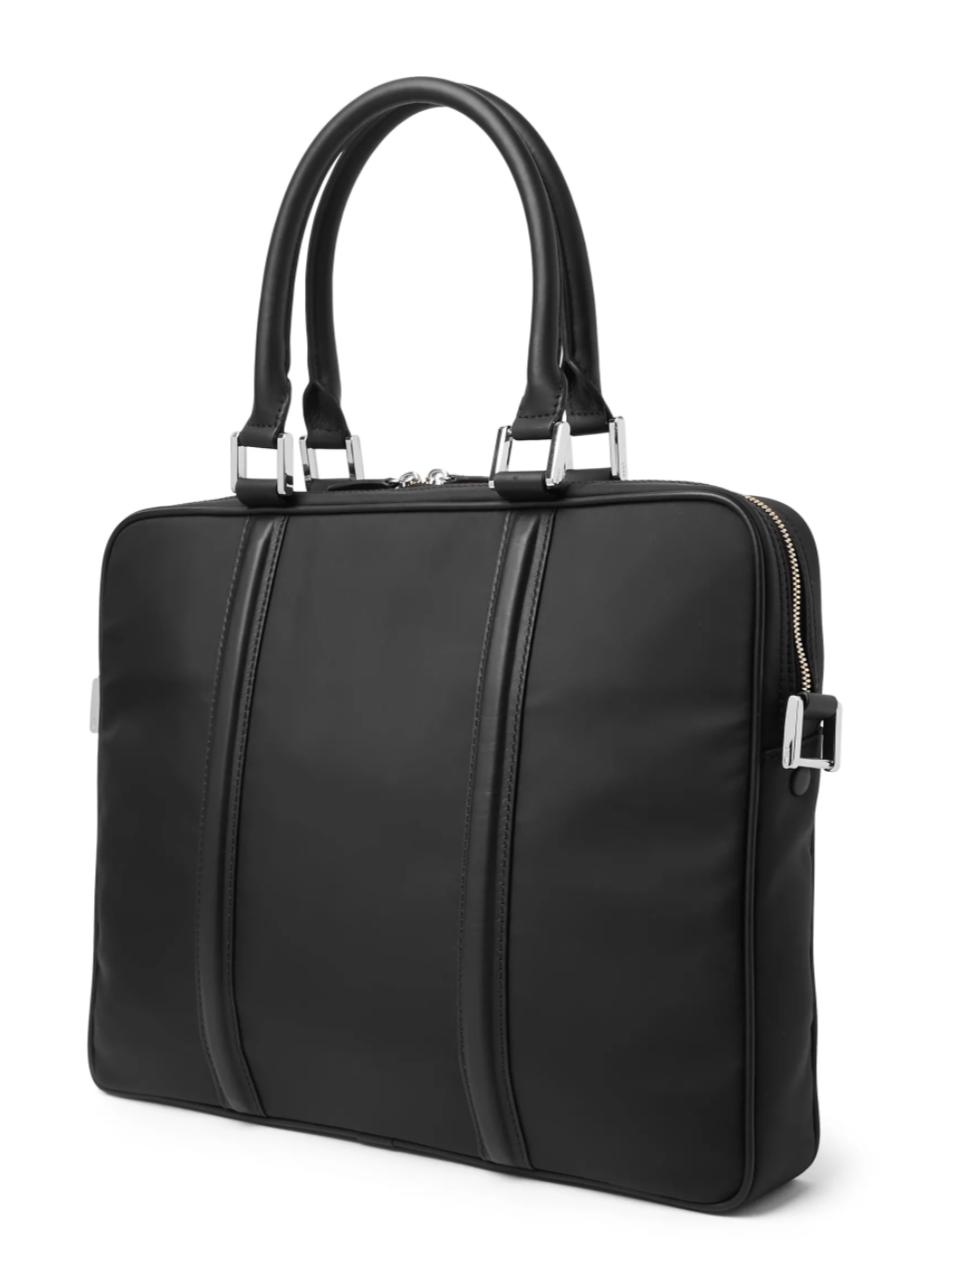 best work bags for men - black nylon briefcase